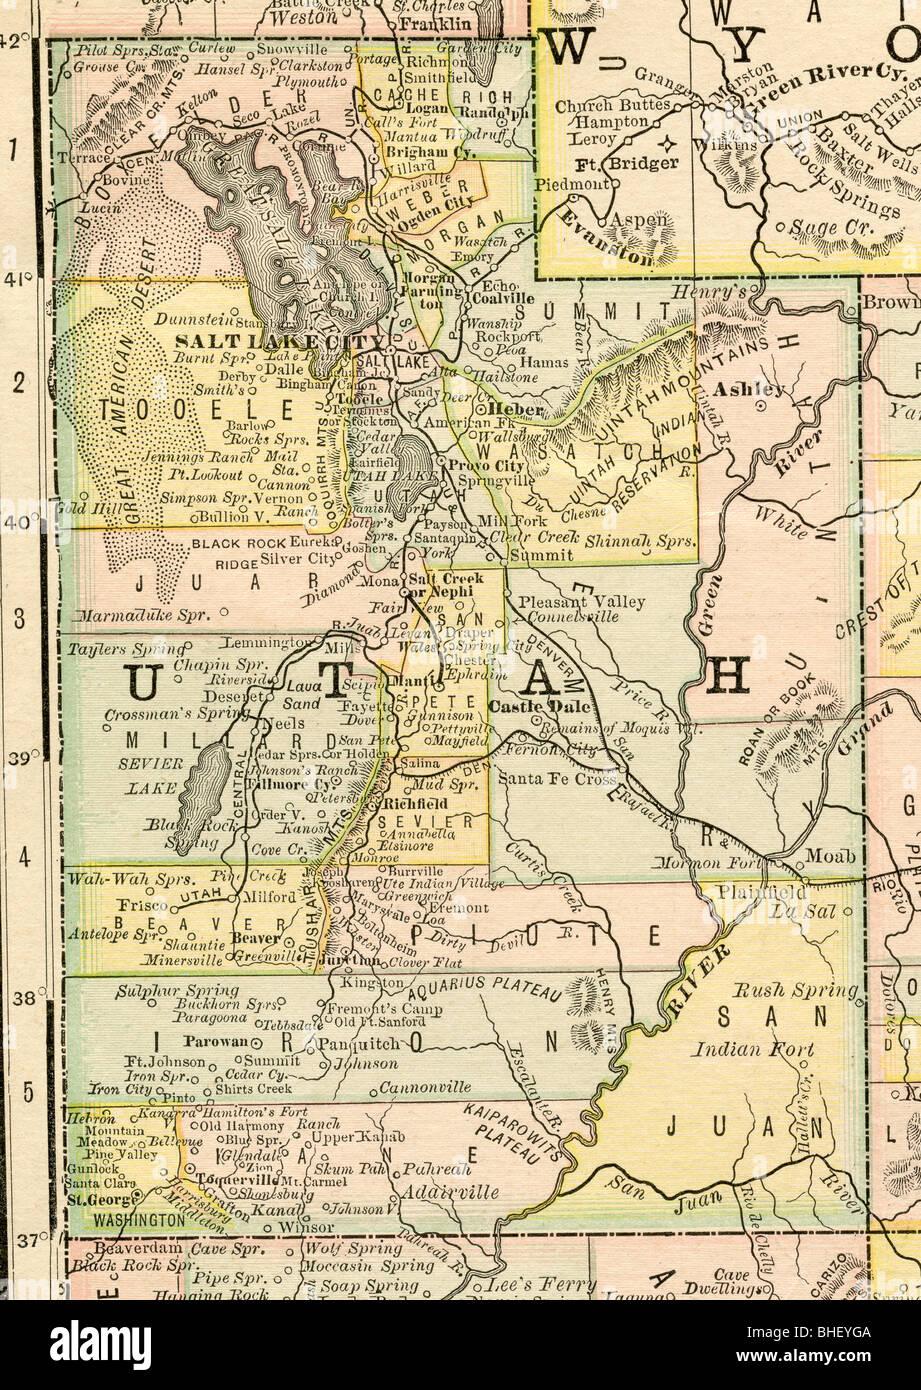 Old Map Of Utah From Original Geography Textbook Stock Photo - Map of utah